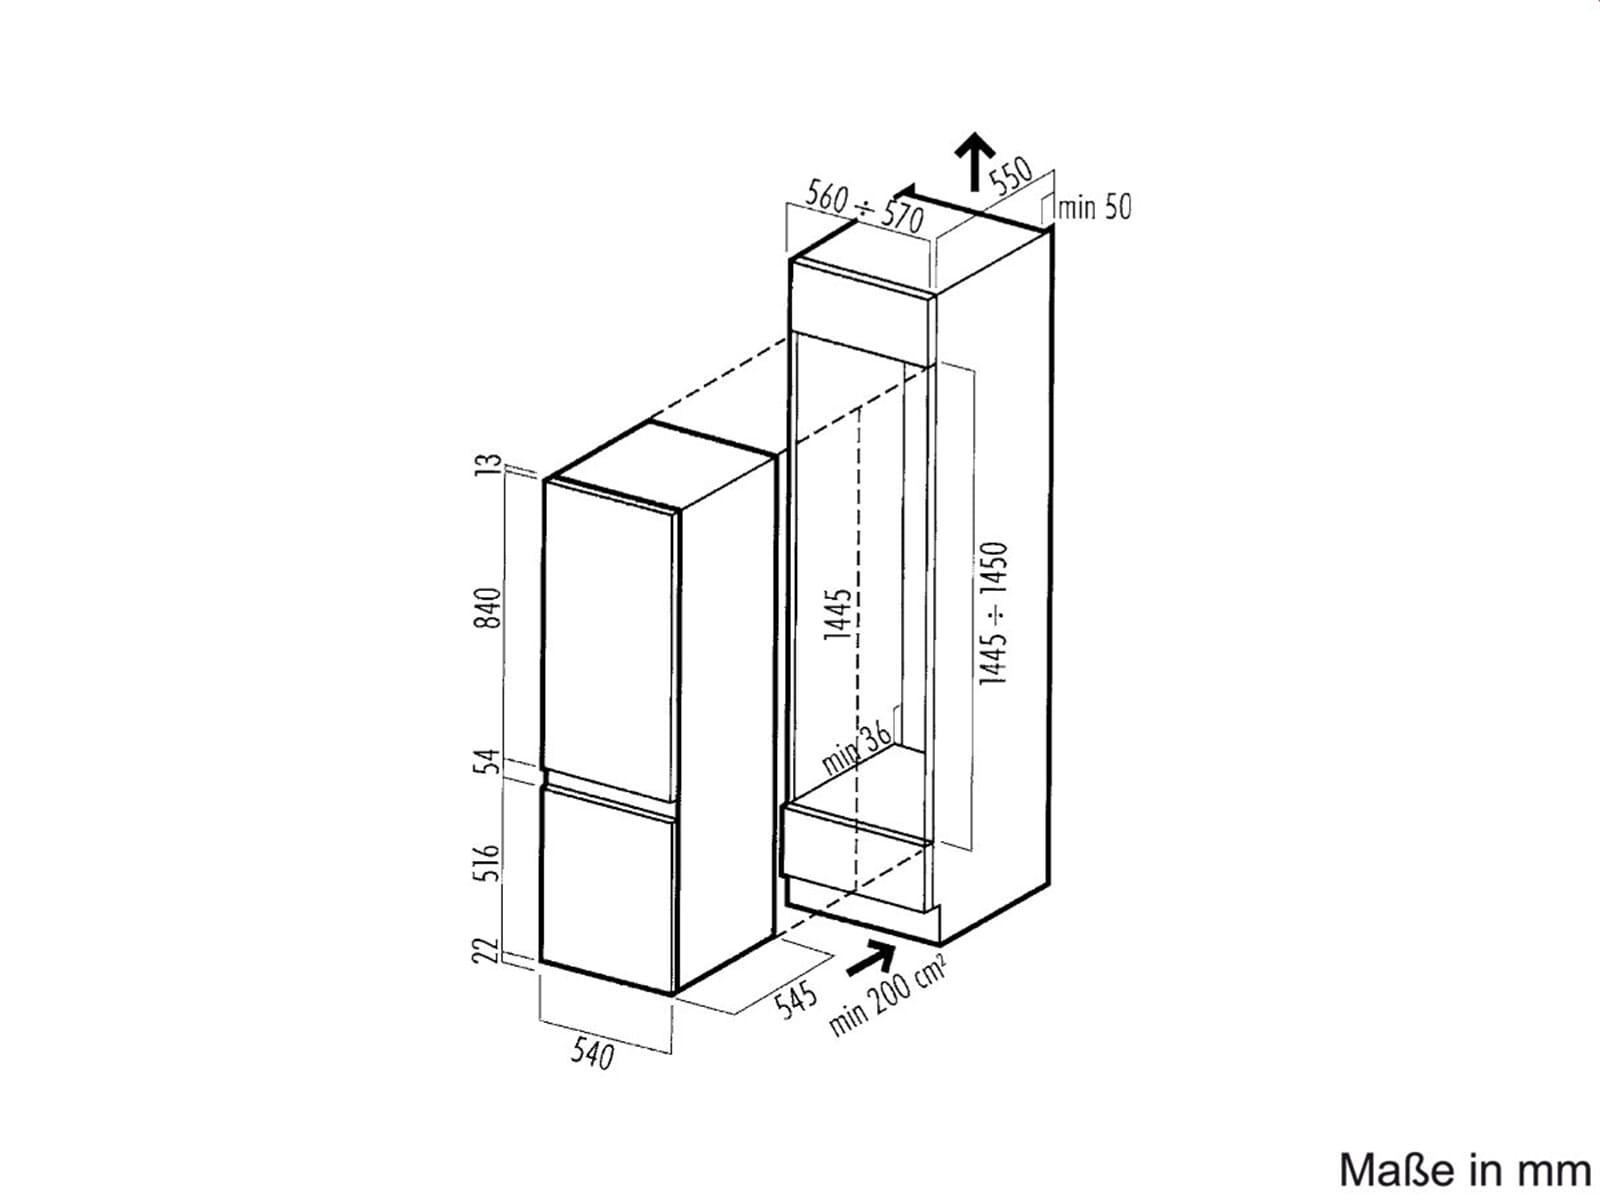 whirlpool arg 316 a einbau k hl gefrier kombination gefrierteil k hlschrank ebay. Black Bedroom Furniture Sets. Home Design Ideas